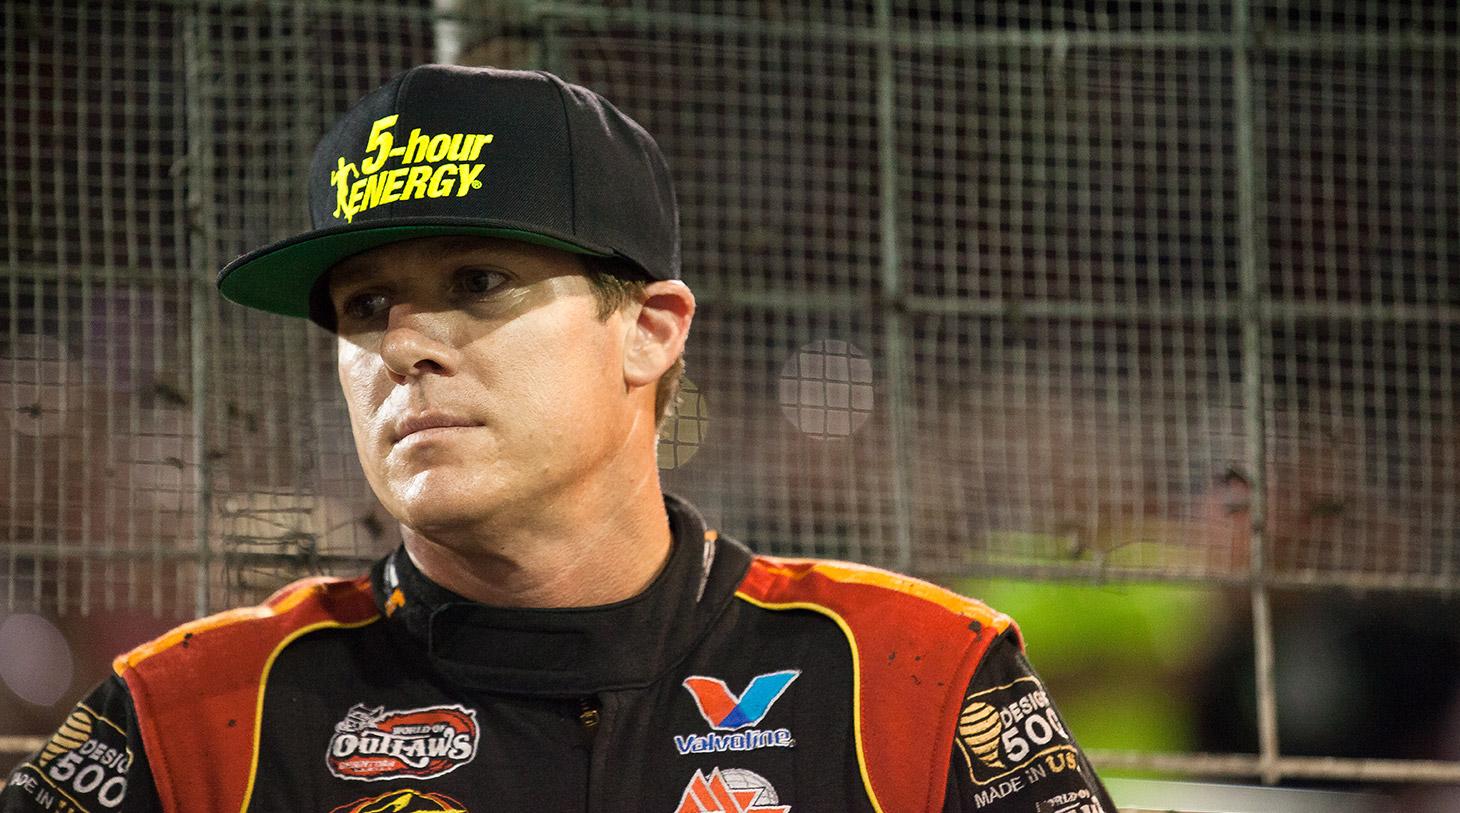 Jason Johnson has won over 240 races during his career. (Jeffrey Turford / TDP)